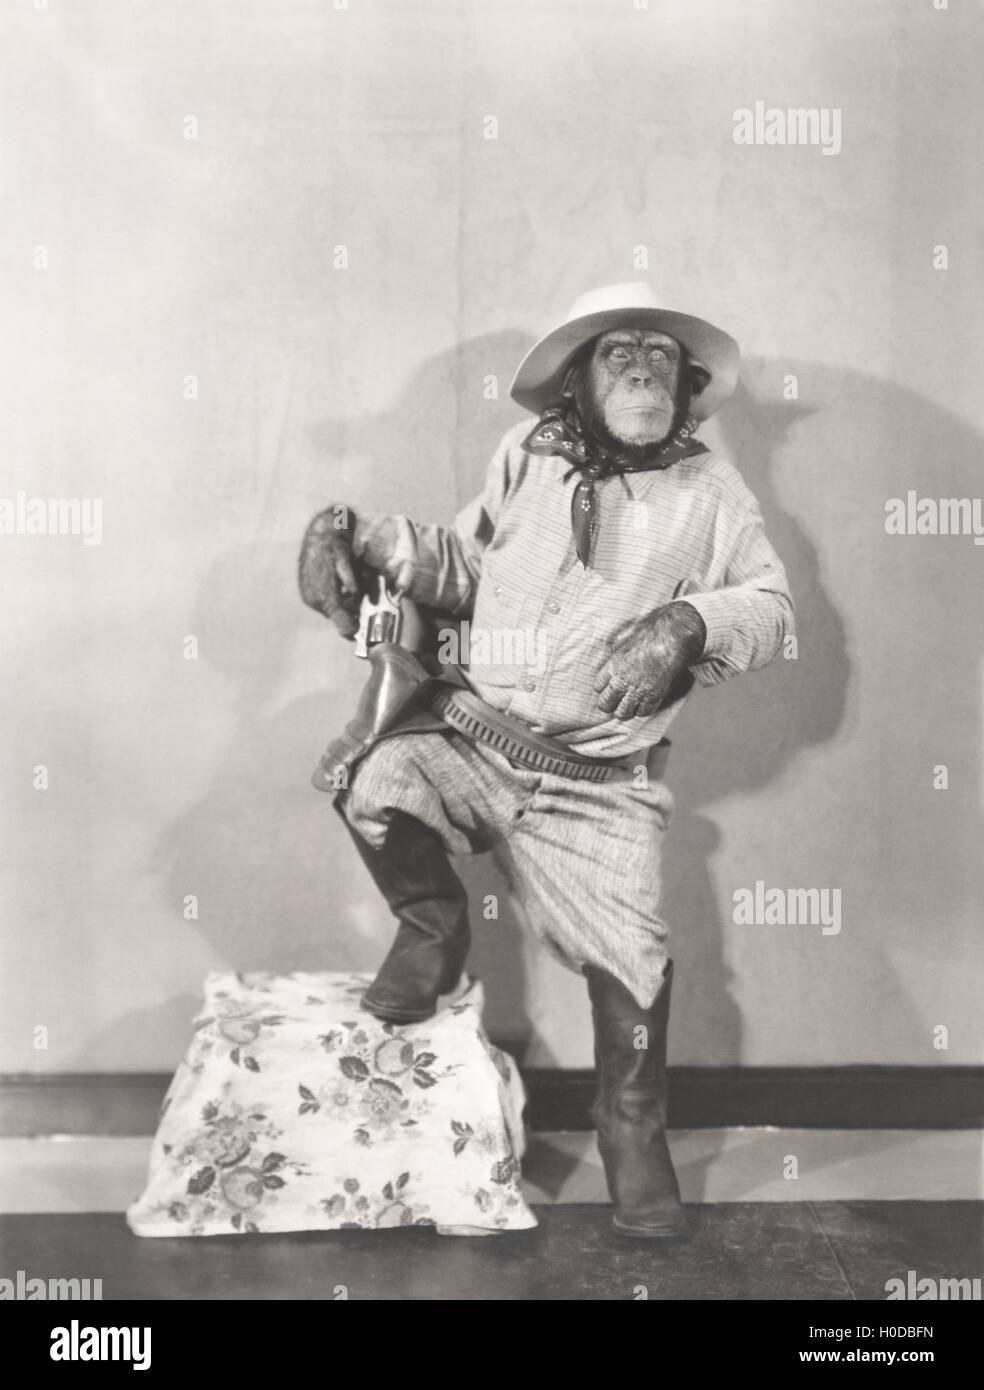 Monkey dressed up like a cowboy Stock Photo